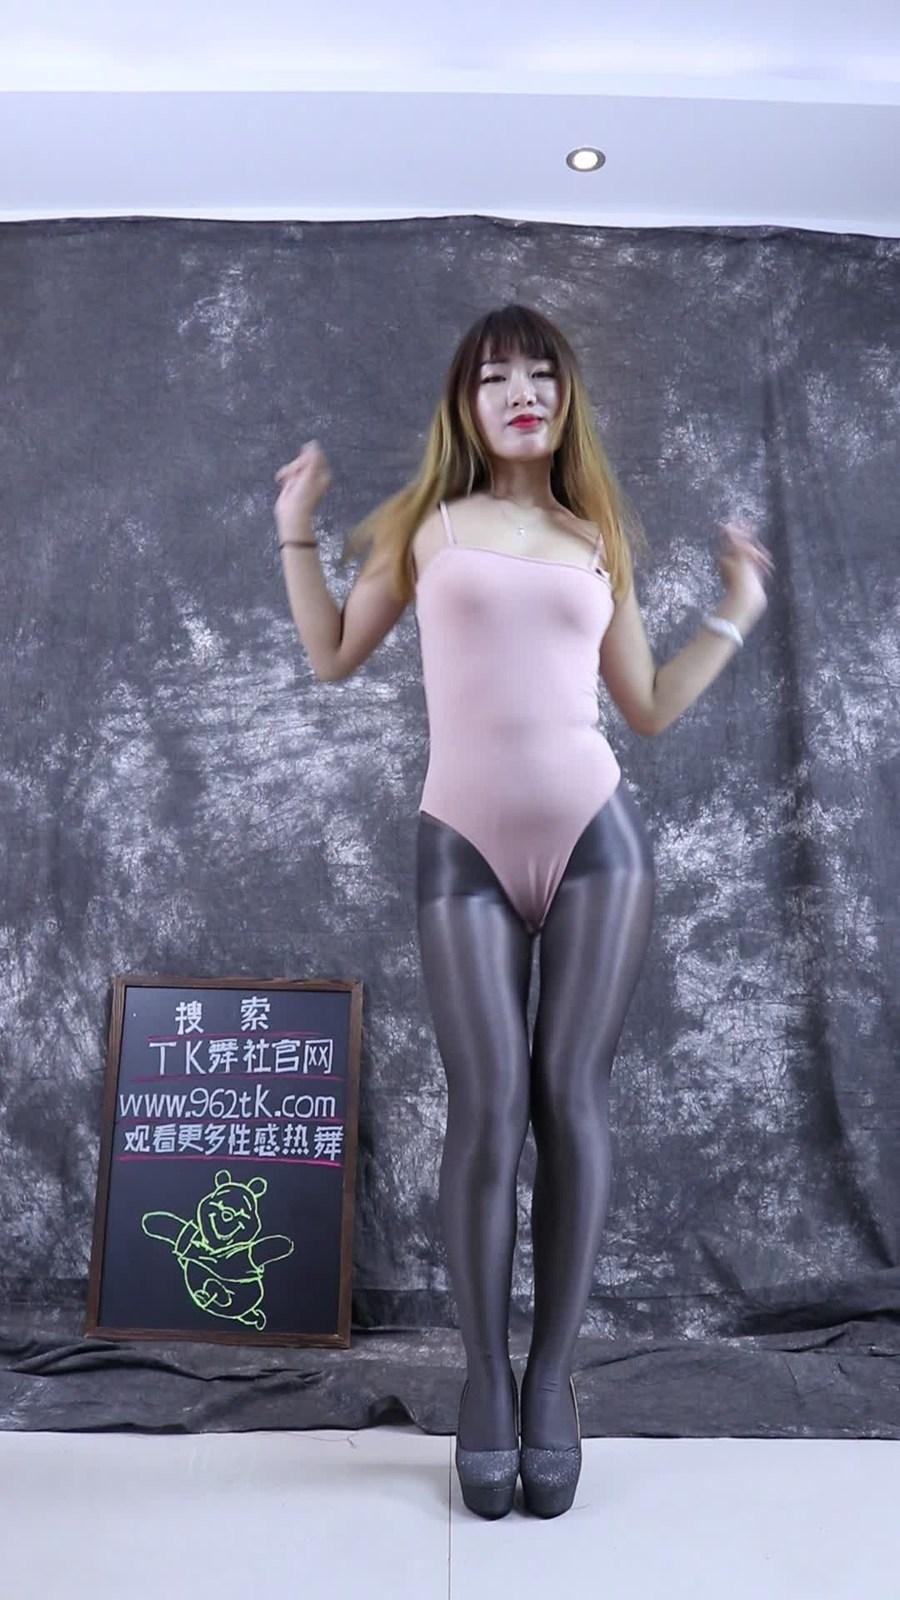 TK舞社 TK舞社 (9)